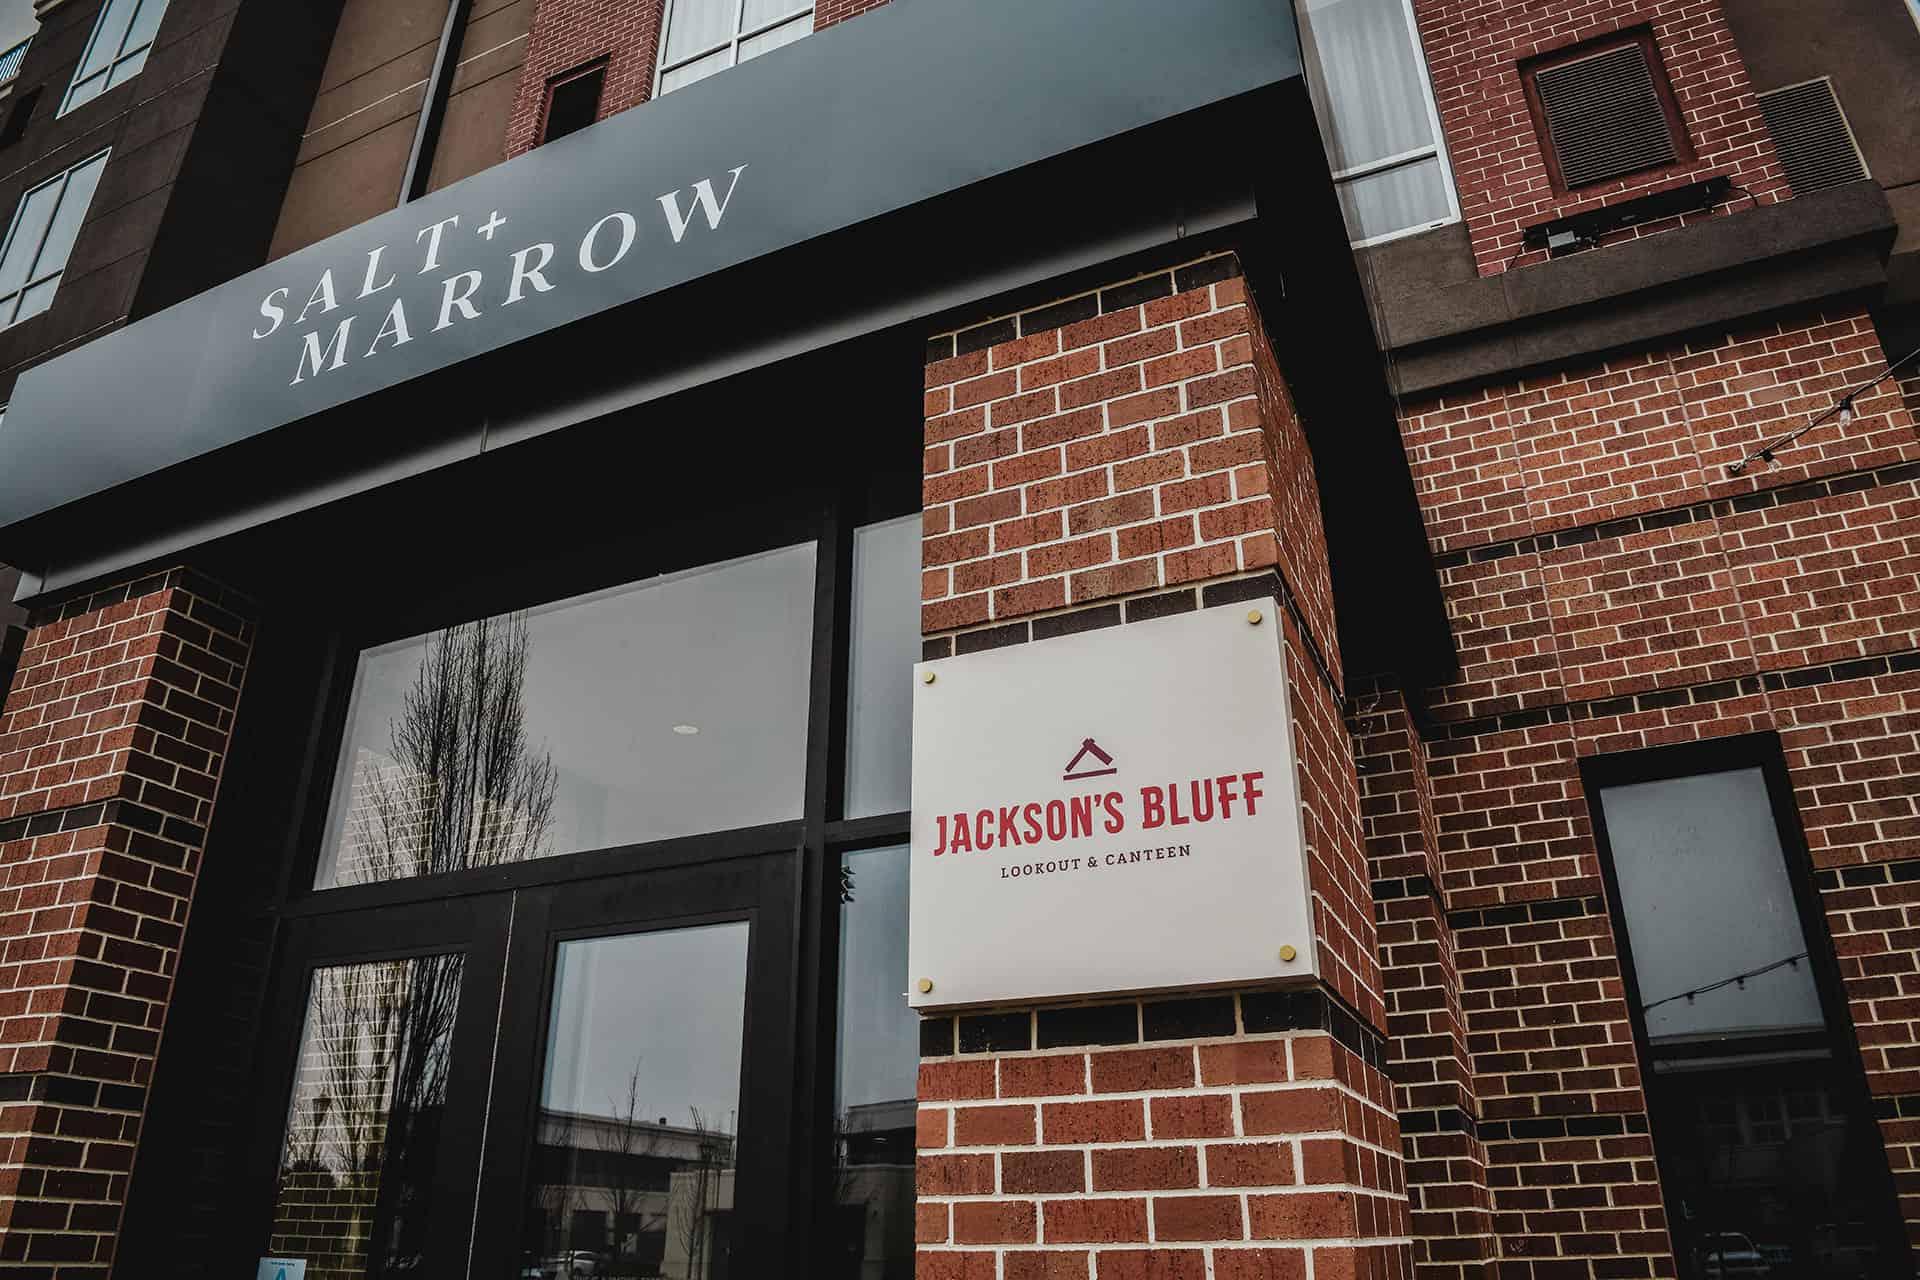 Salt & Marrow hotel restaurant F&B branding and design